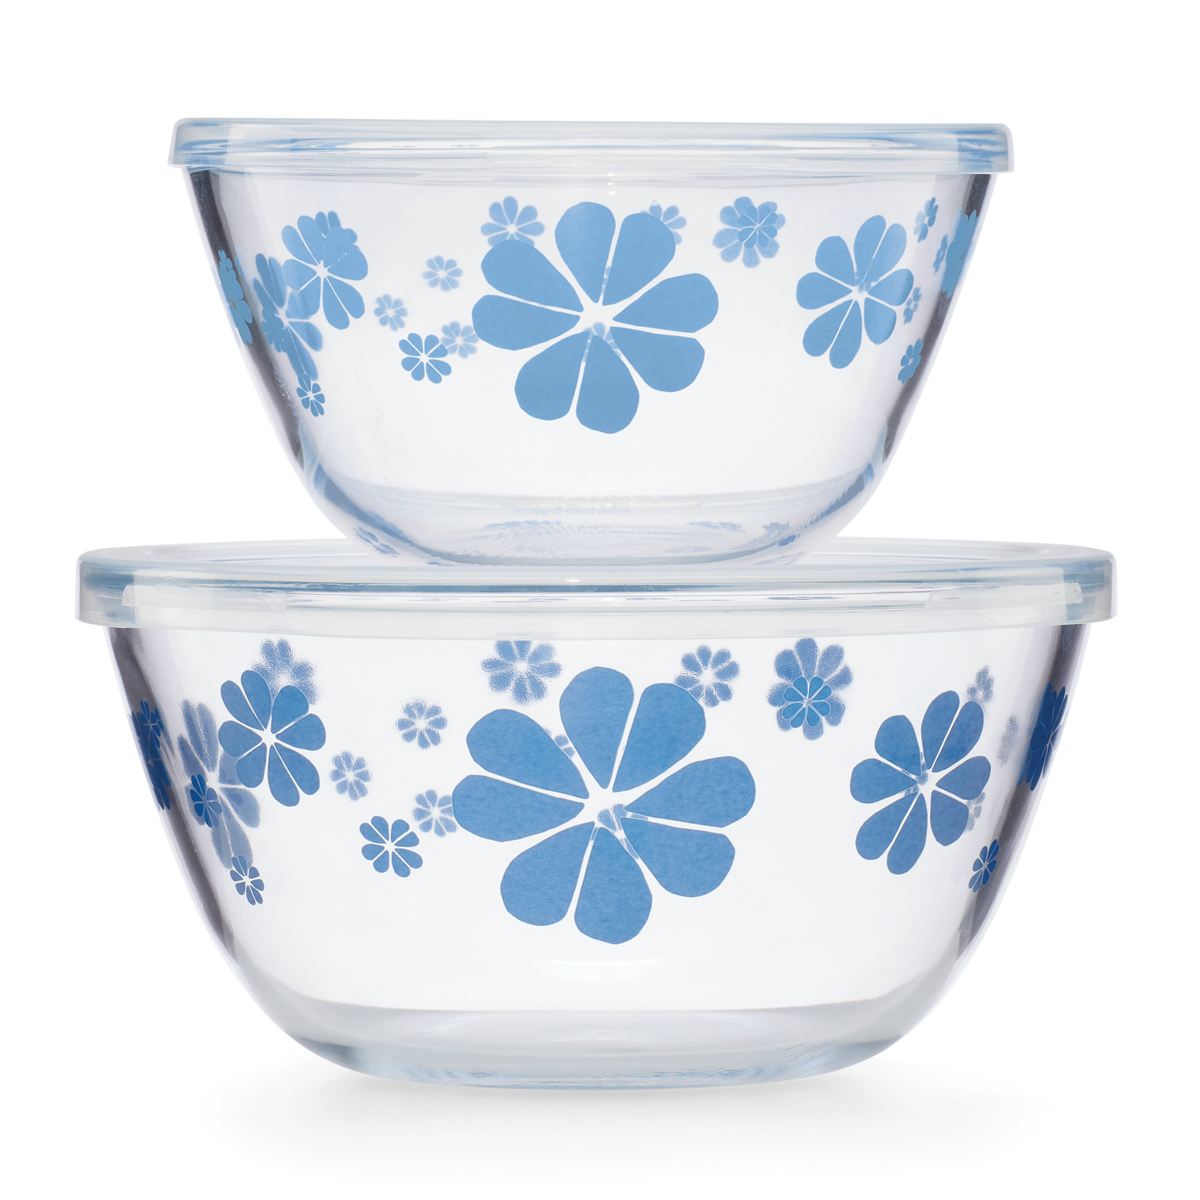 Kate Spade China by Lenox, Nolita Blue Serve and Store Set of 2